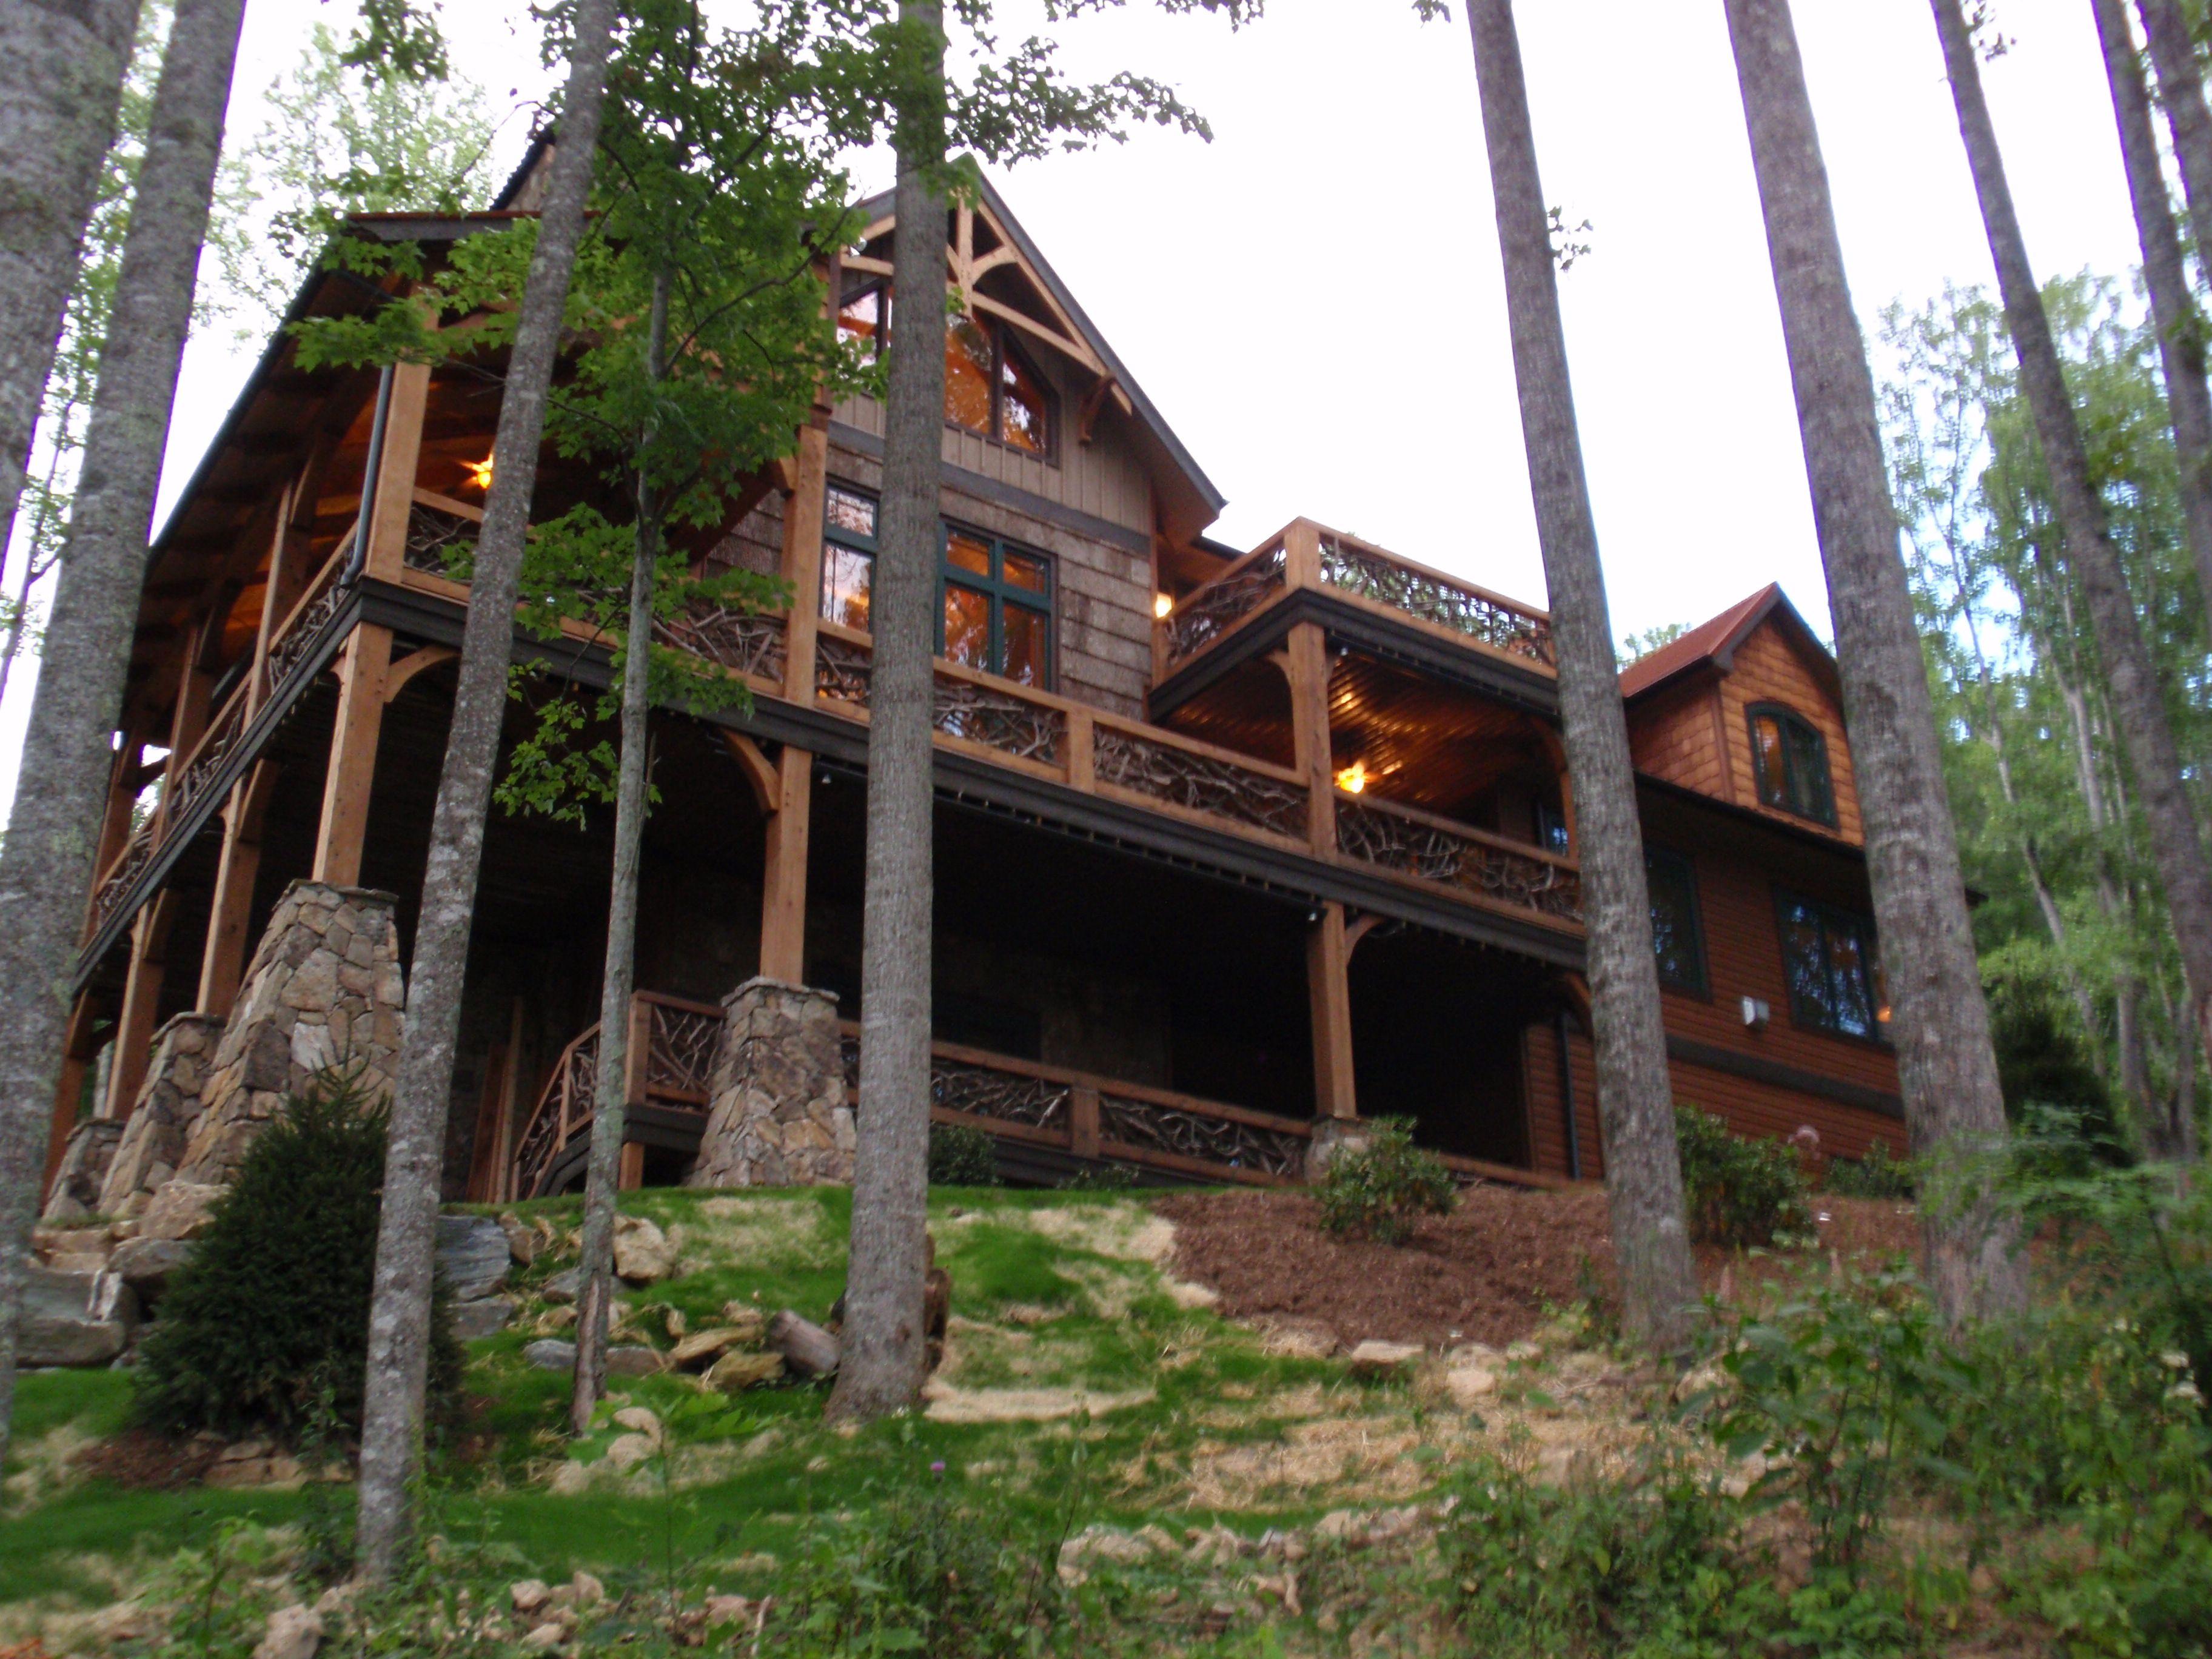 nest elkcabin cabin banner lodge and tub rentals with rentalsvacation cabins pin home eagles firepit hot elk